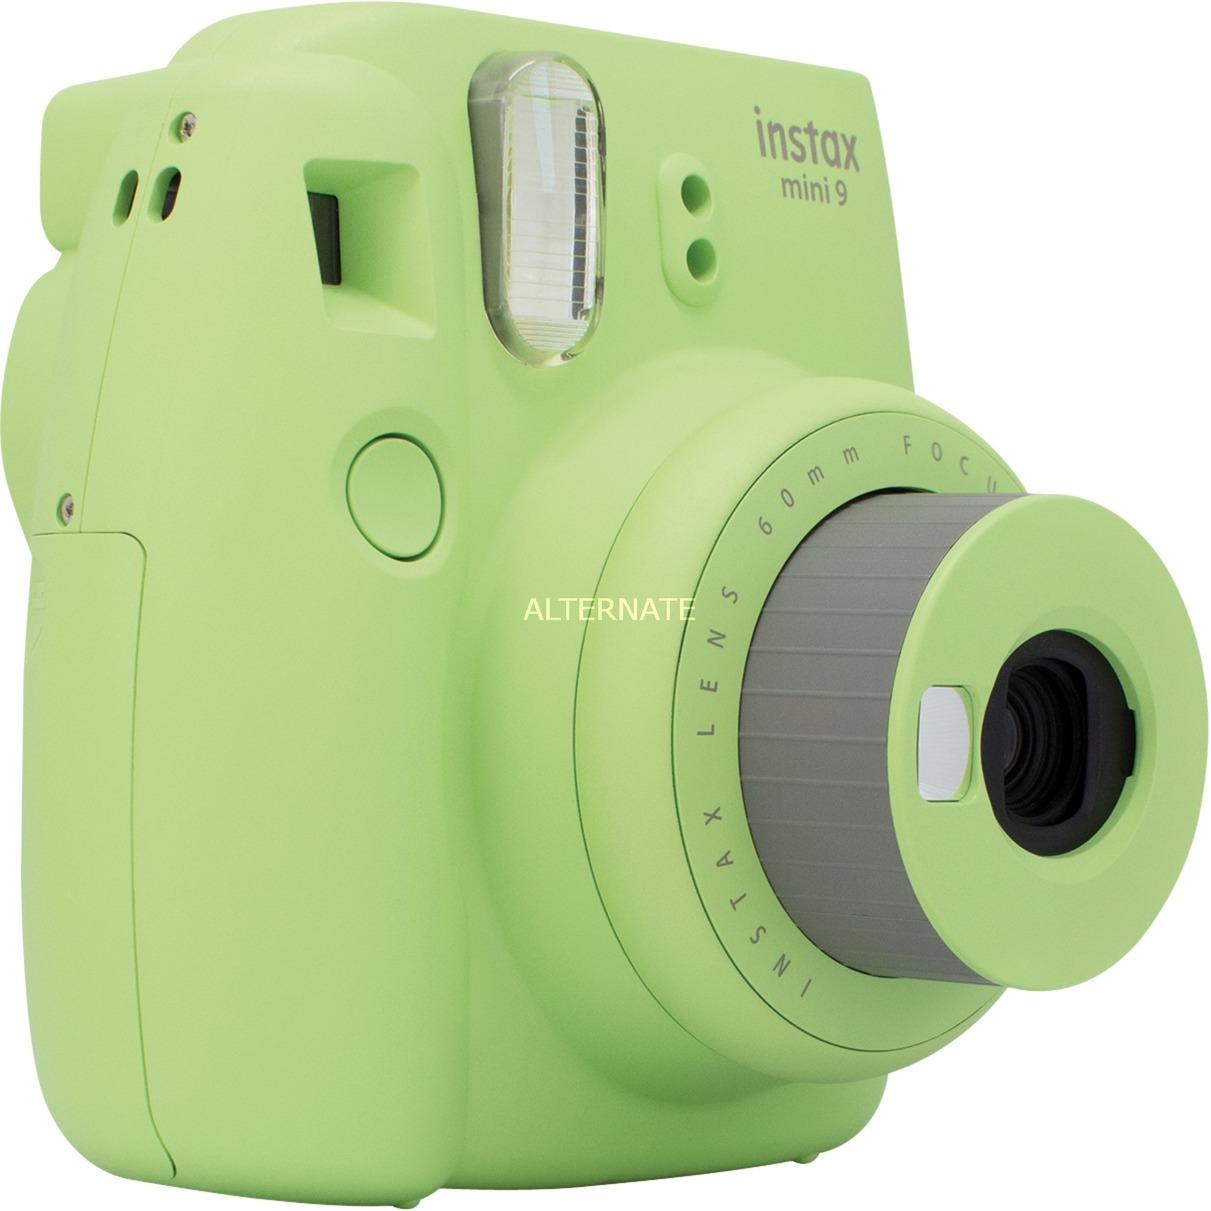 Instax Mini 9 cámara instantánea impresión 62 x 46 mm Verde, Cal